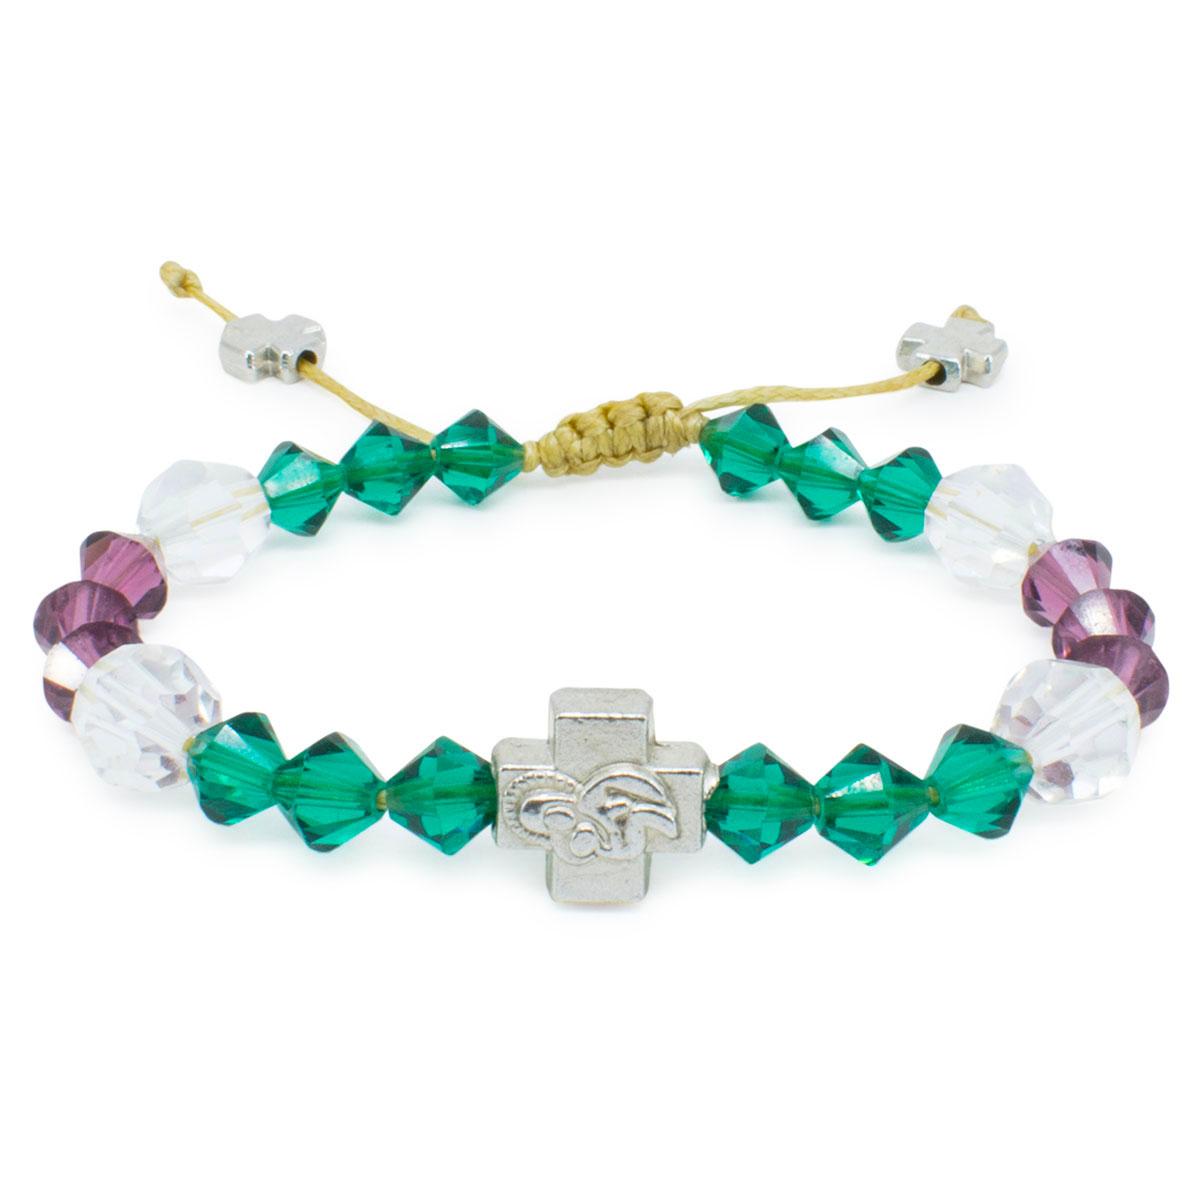 79005b91c75 Exquisite And Original Swarovski Crystal Prayer Bracelet